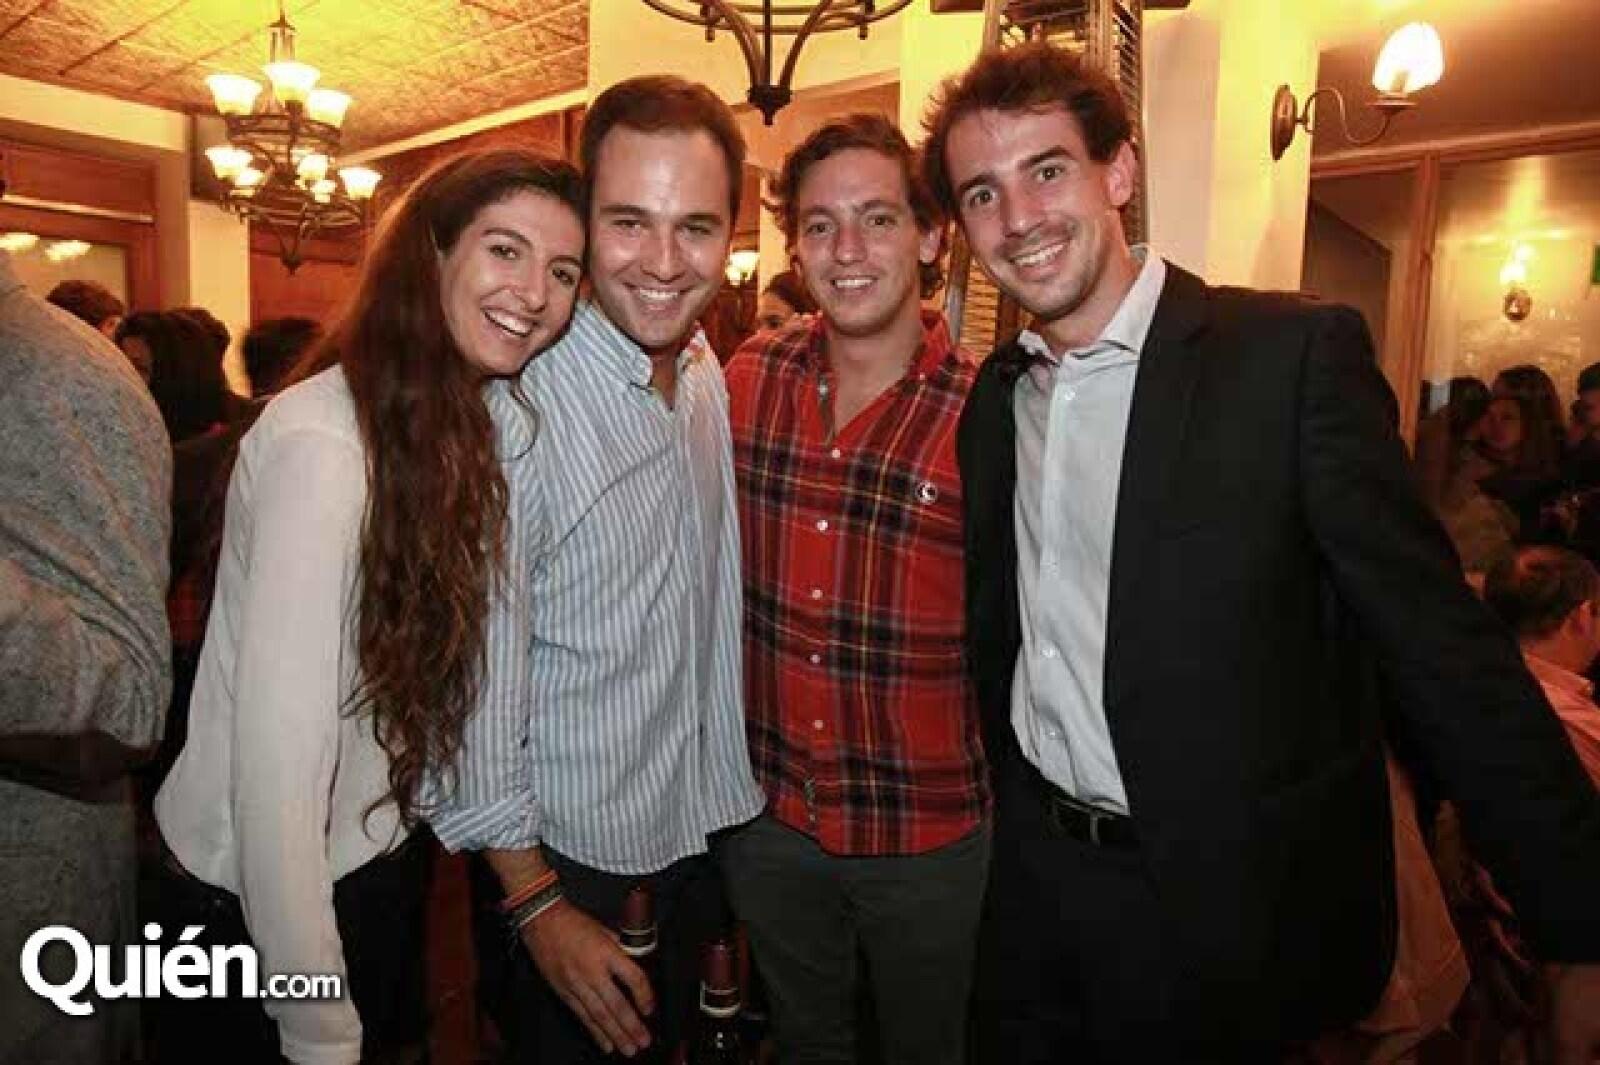 Carla Espadas,Chemi Martín,Rori Cadavieco y Pablo Galiana